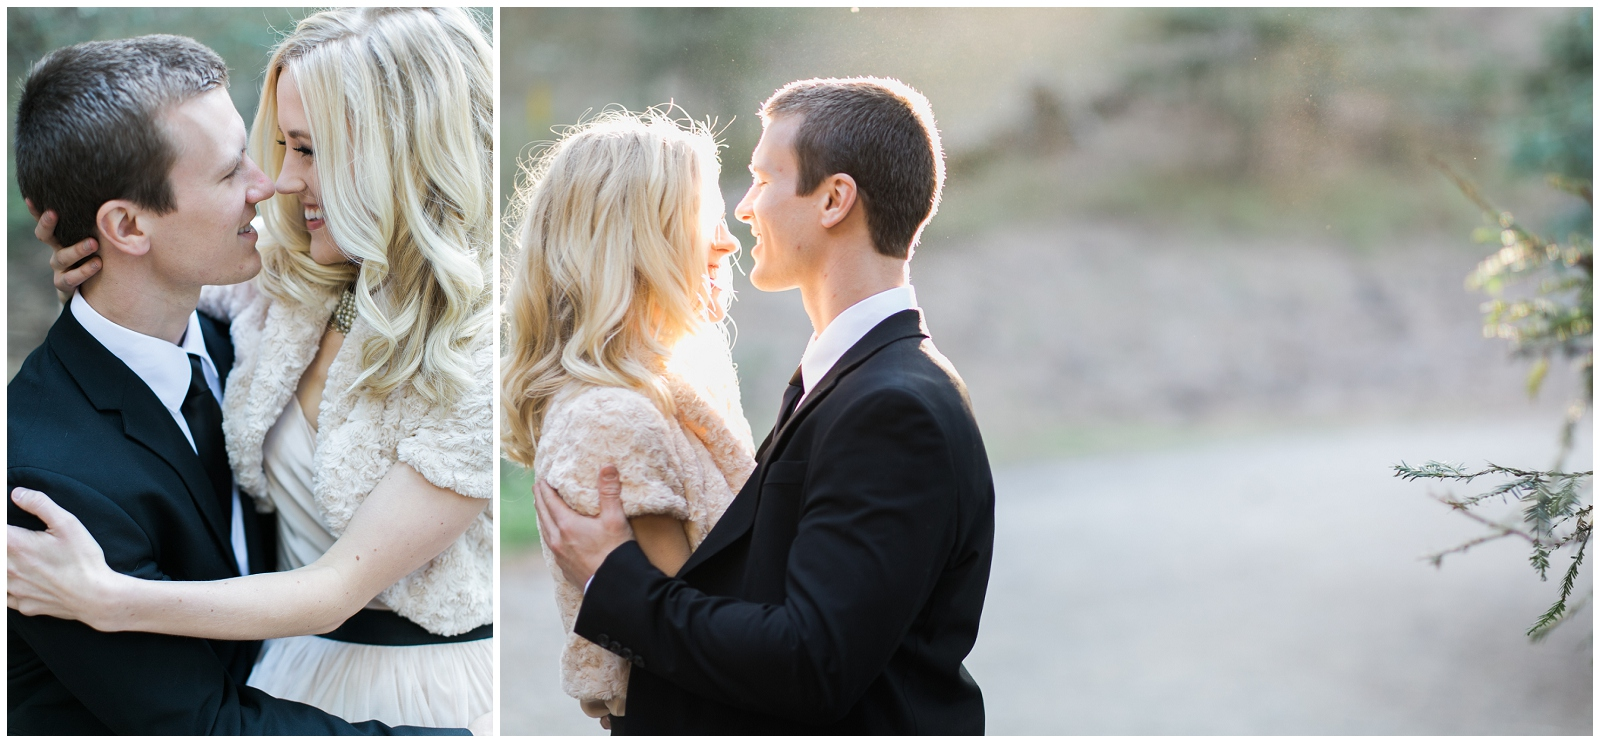 San-Francisco-Bay-Area-Wedding-Photography-Engagement-Redwoods-5.jpg